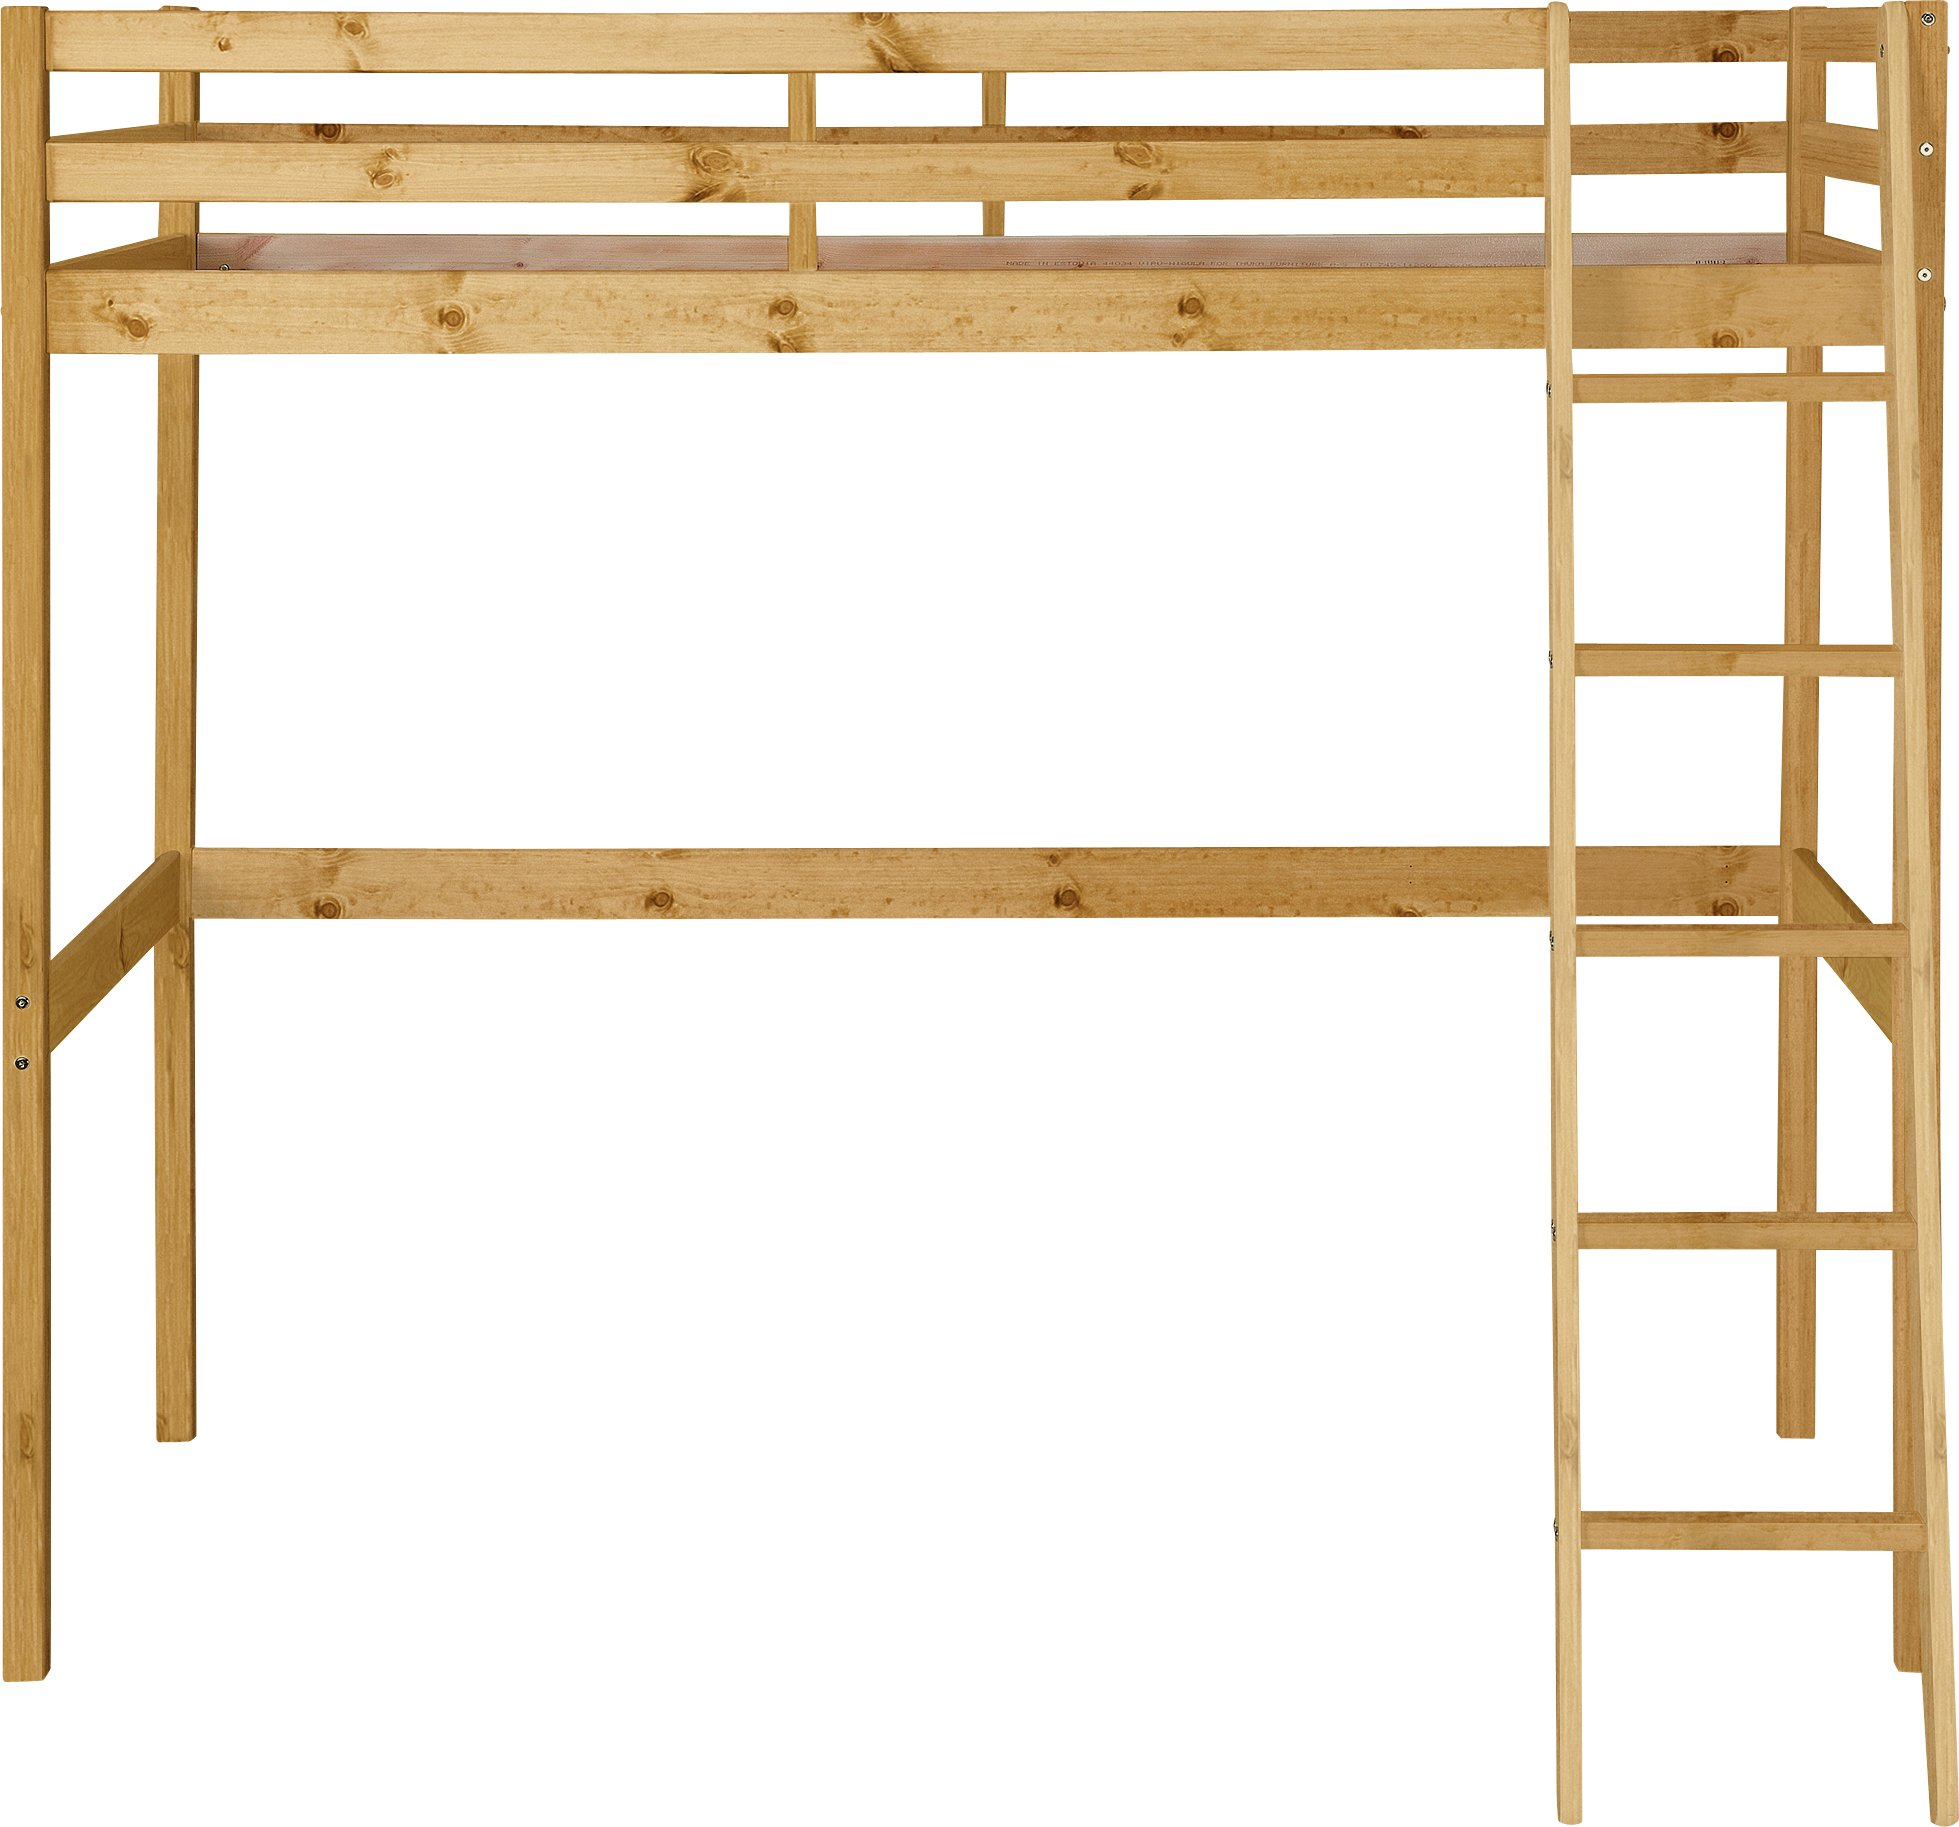 Argos Home Kaycie High Sleeper Single Bed Frame - Pine